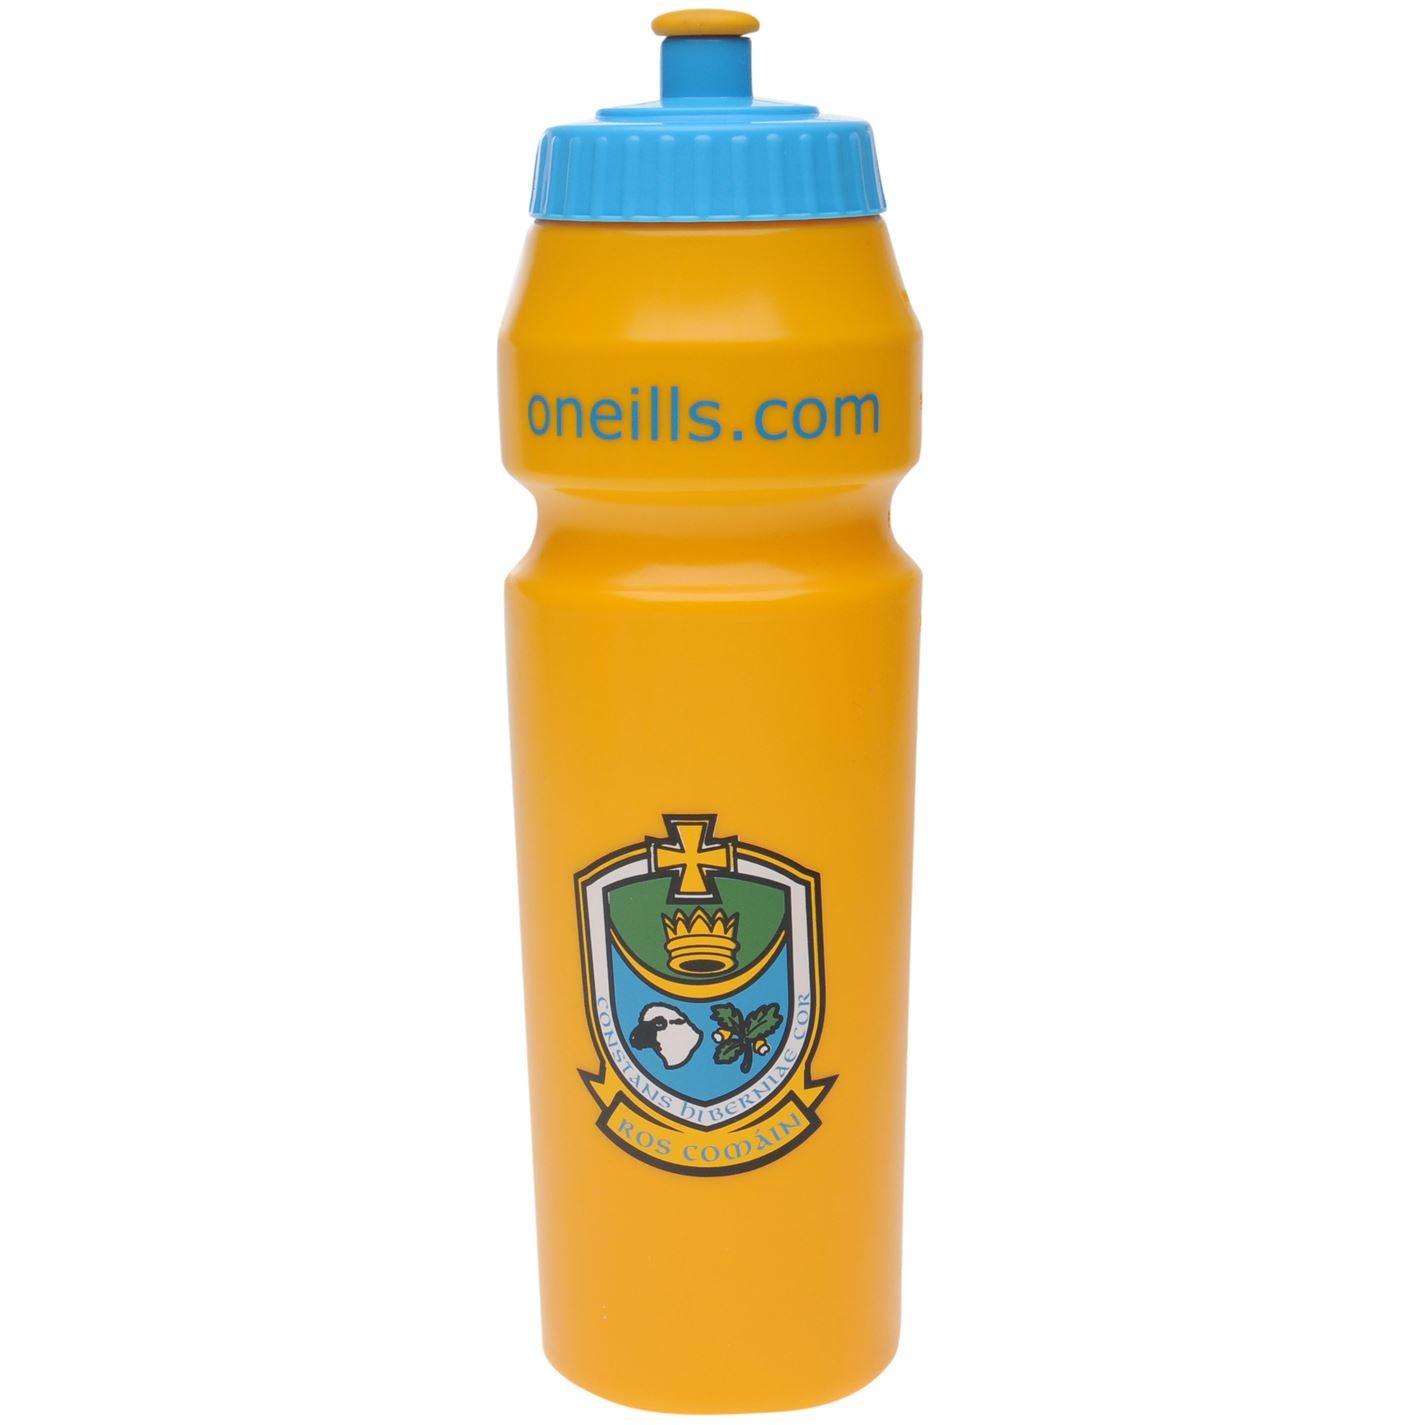 ONeills Roscommon GAA Water Bottle